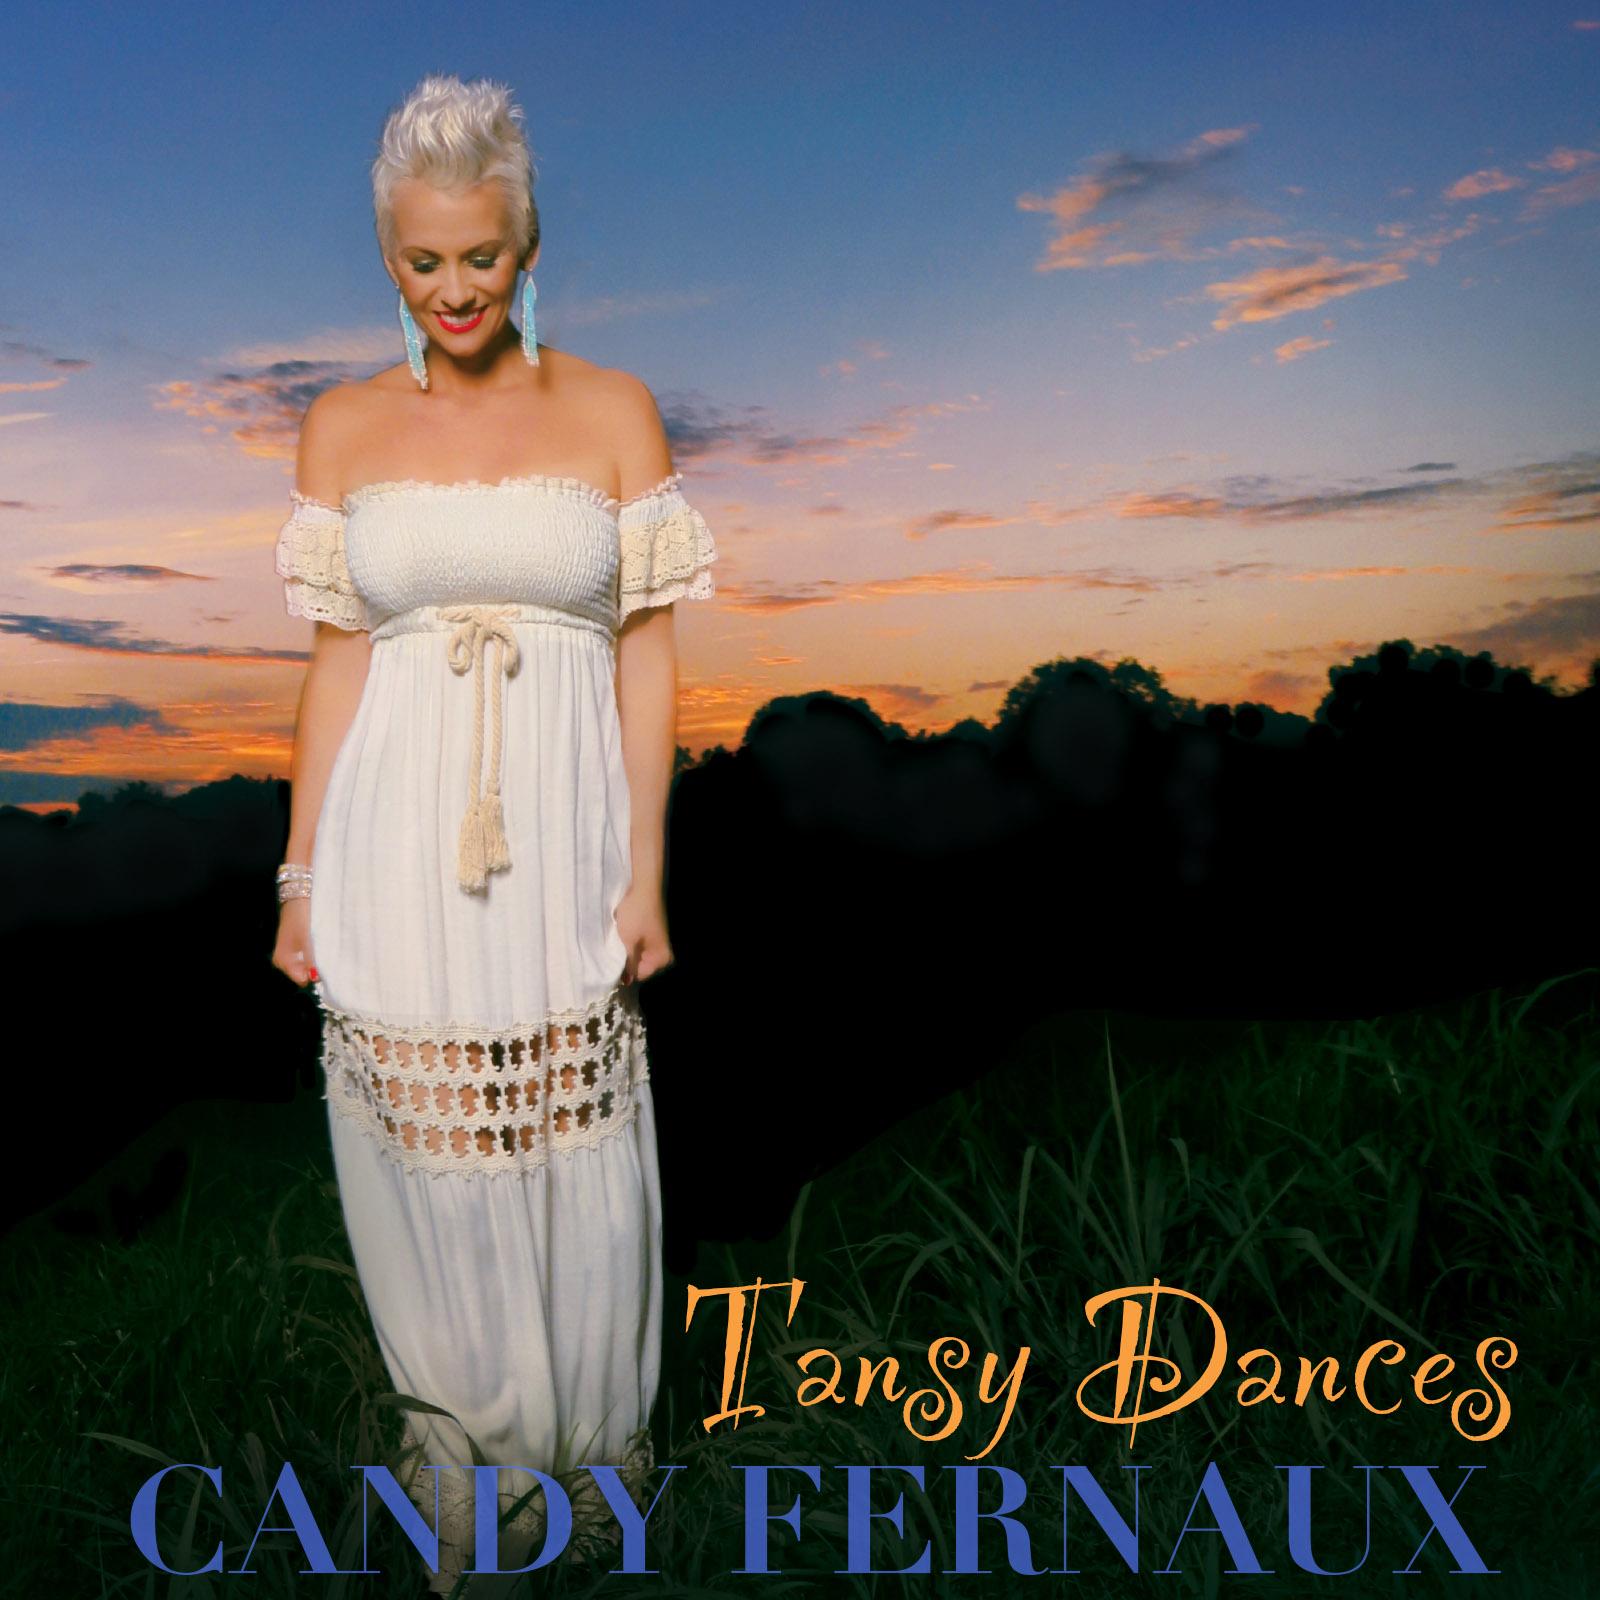 farm girl album cover